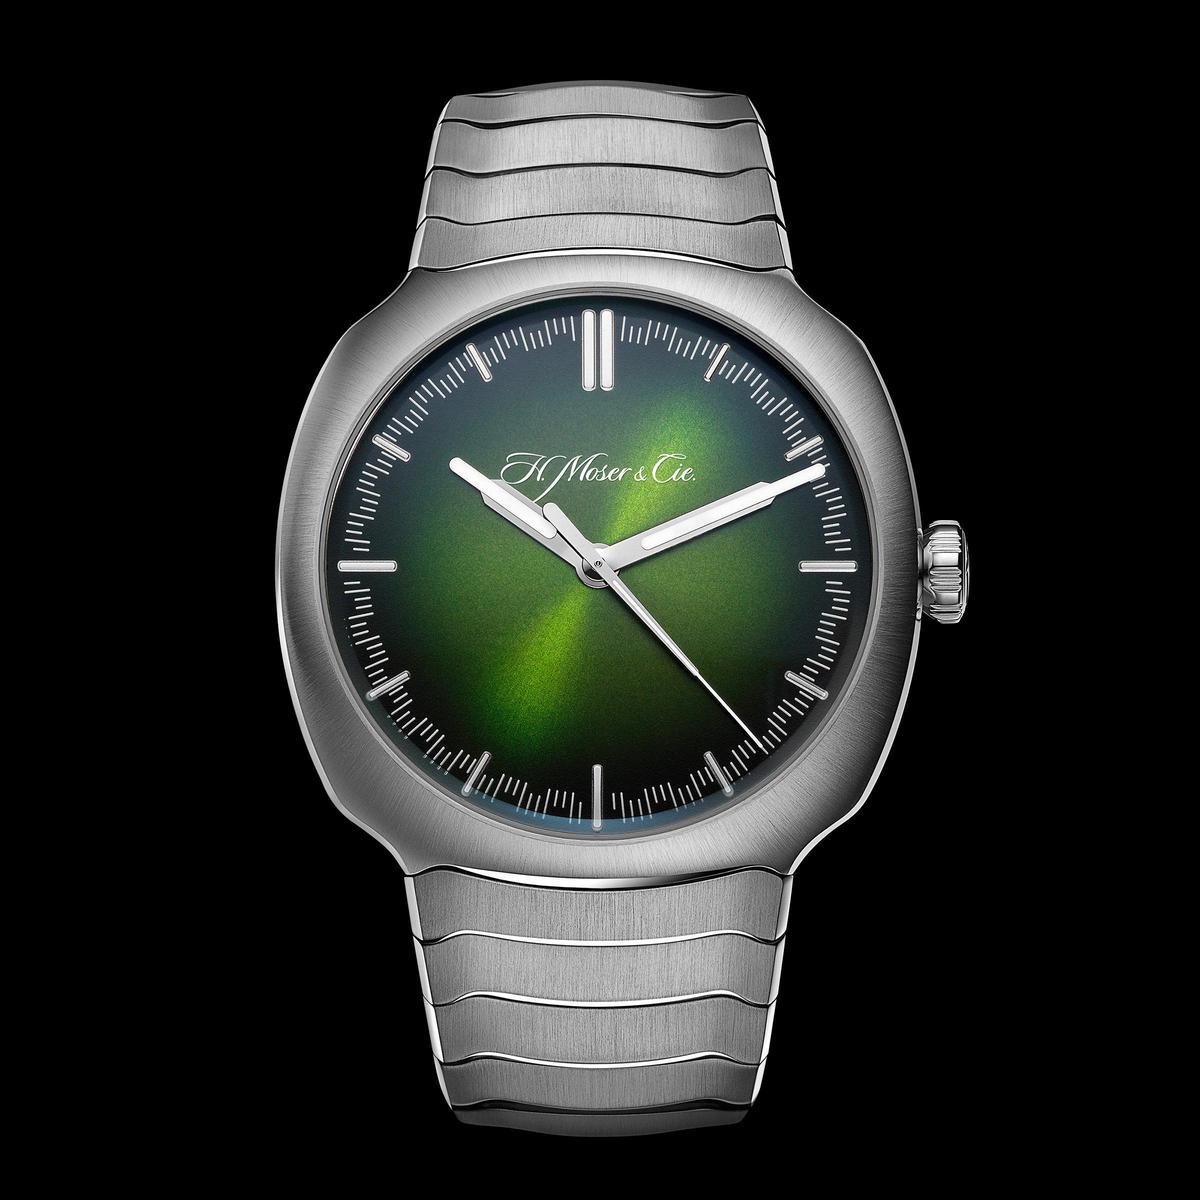 全新Streamliner大三針腕錶,定價NT$708,000。